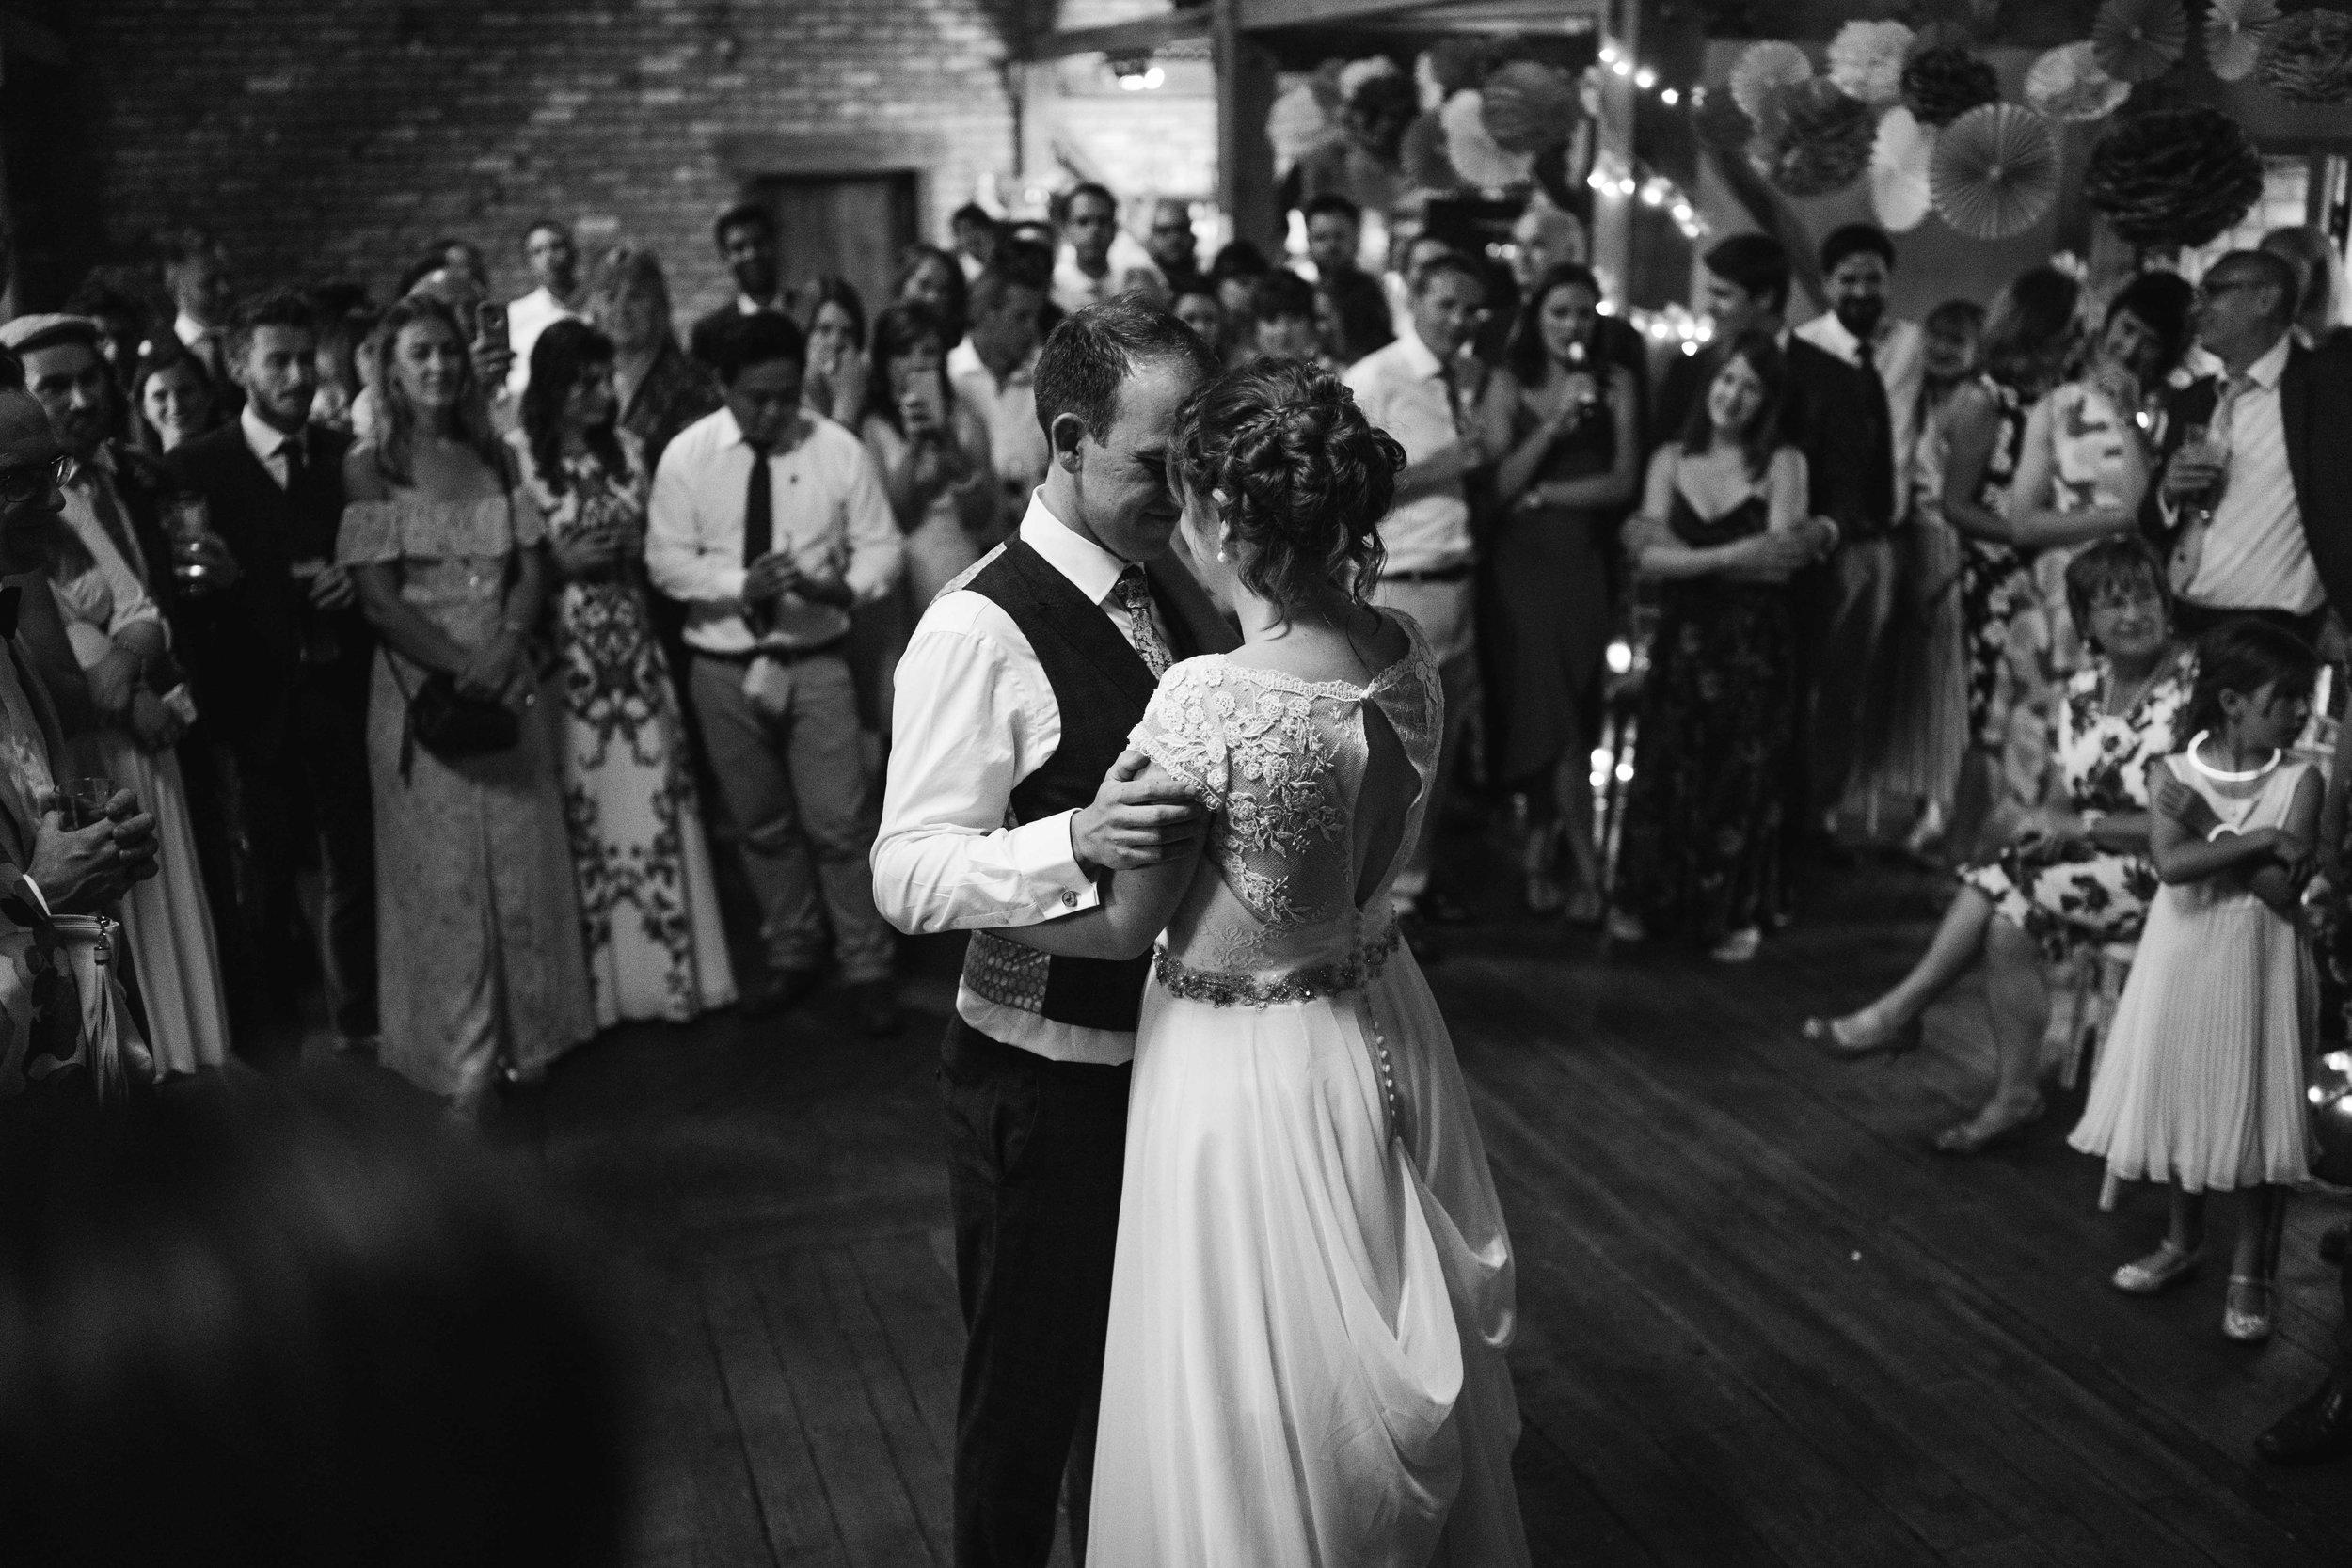 kent-wedding-photographer-08836.jpg